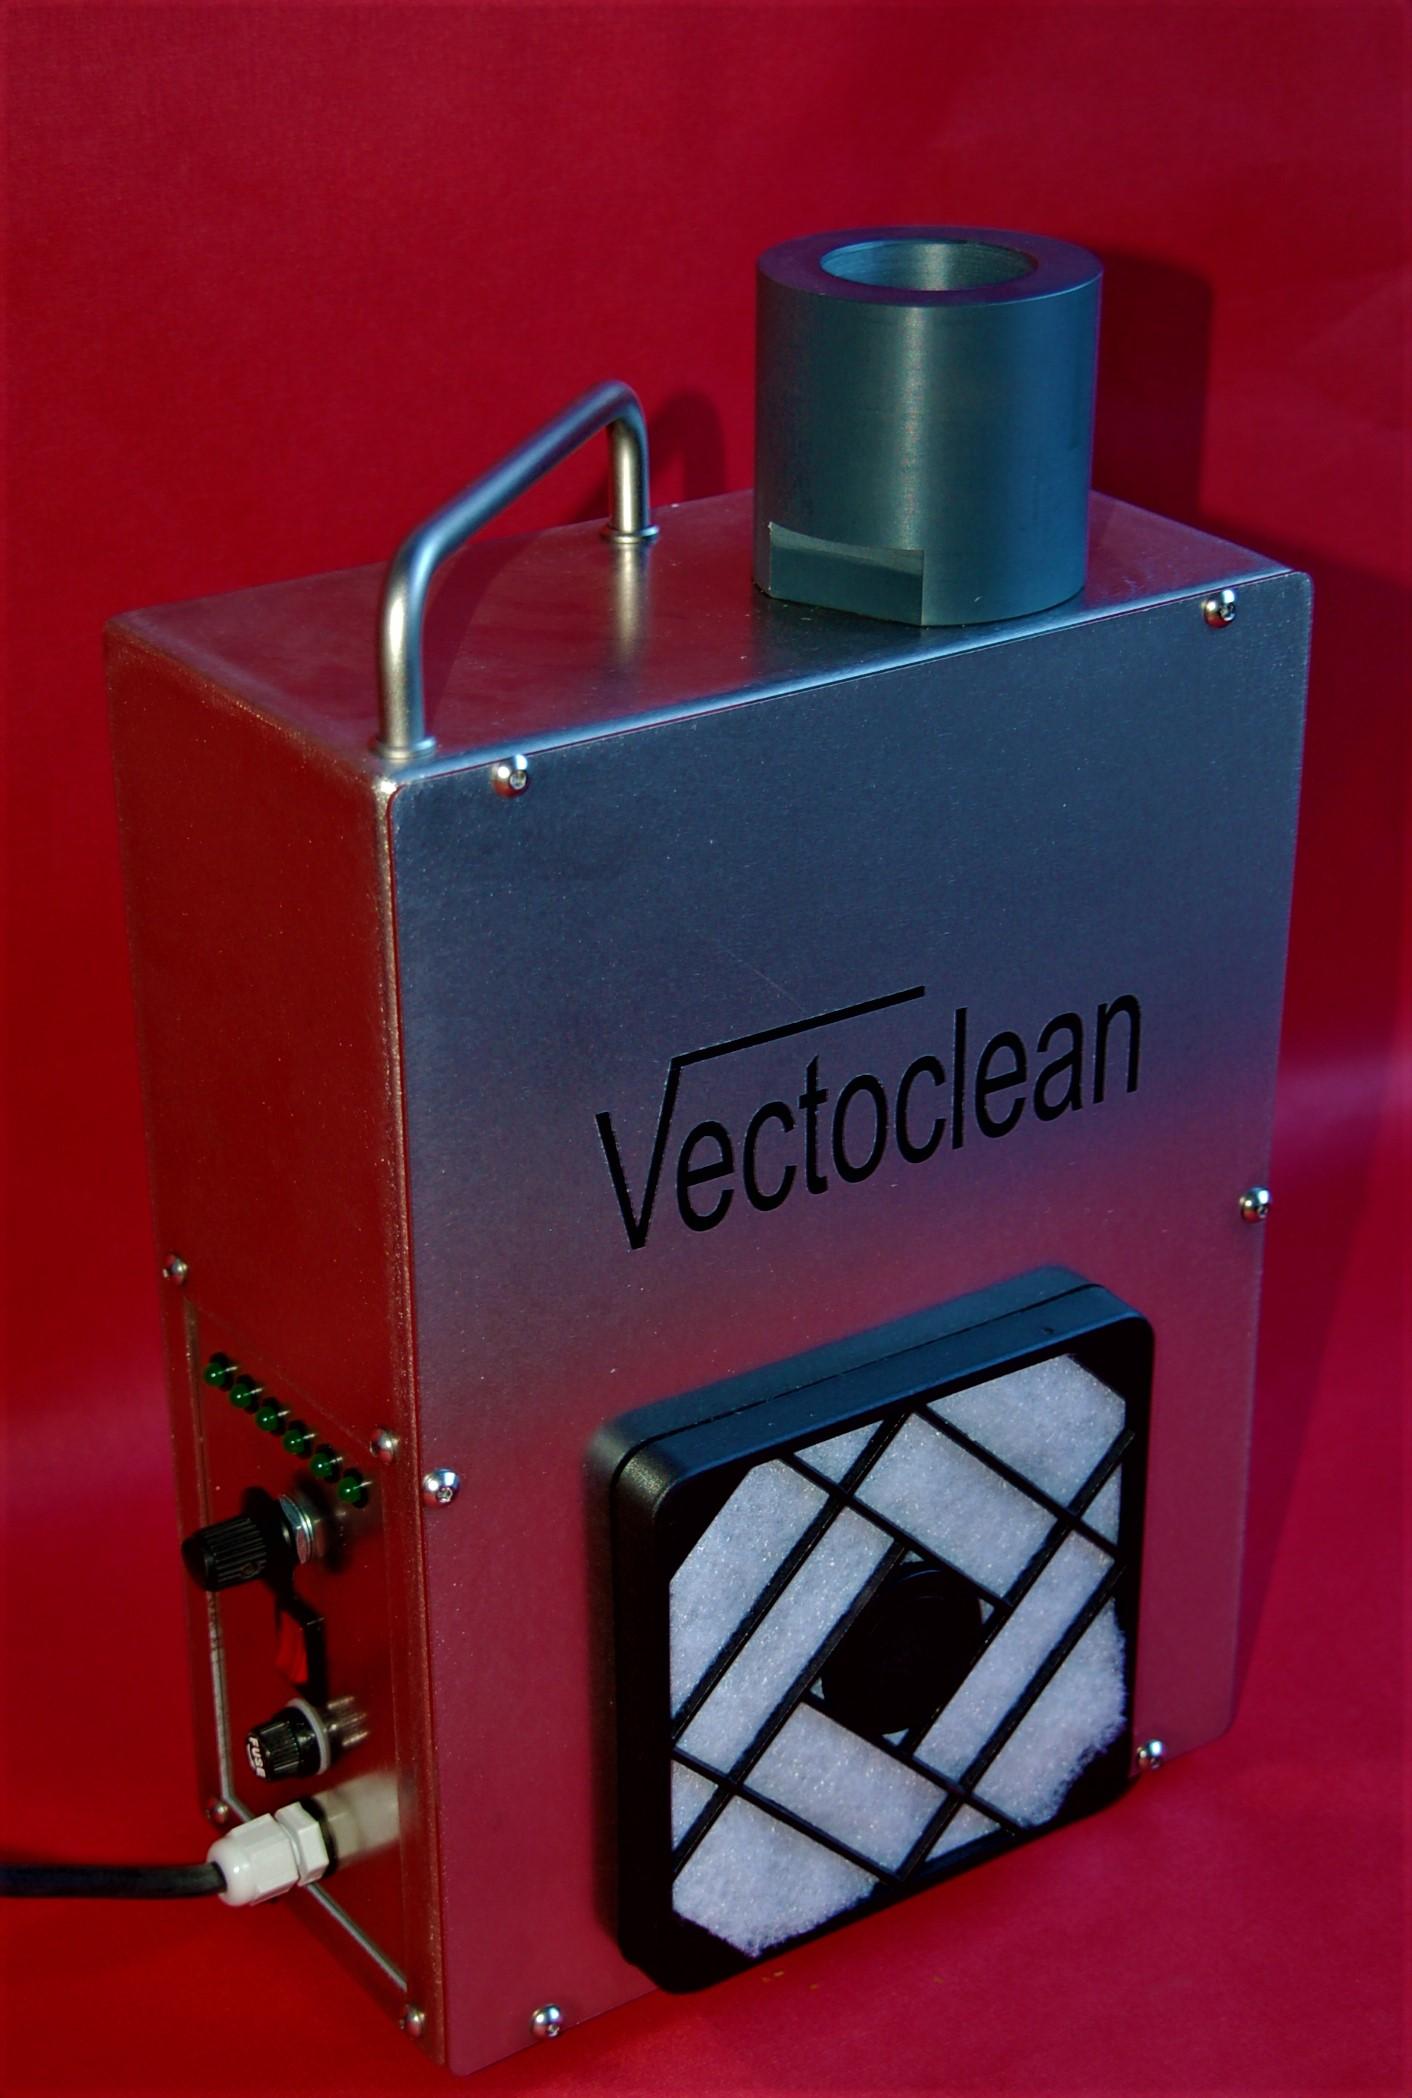 Vectoclean